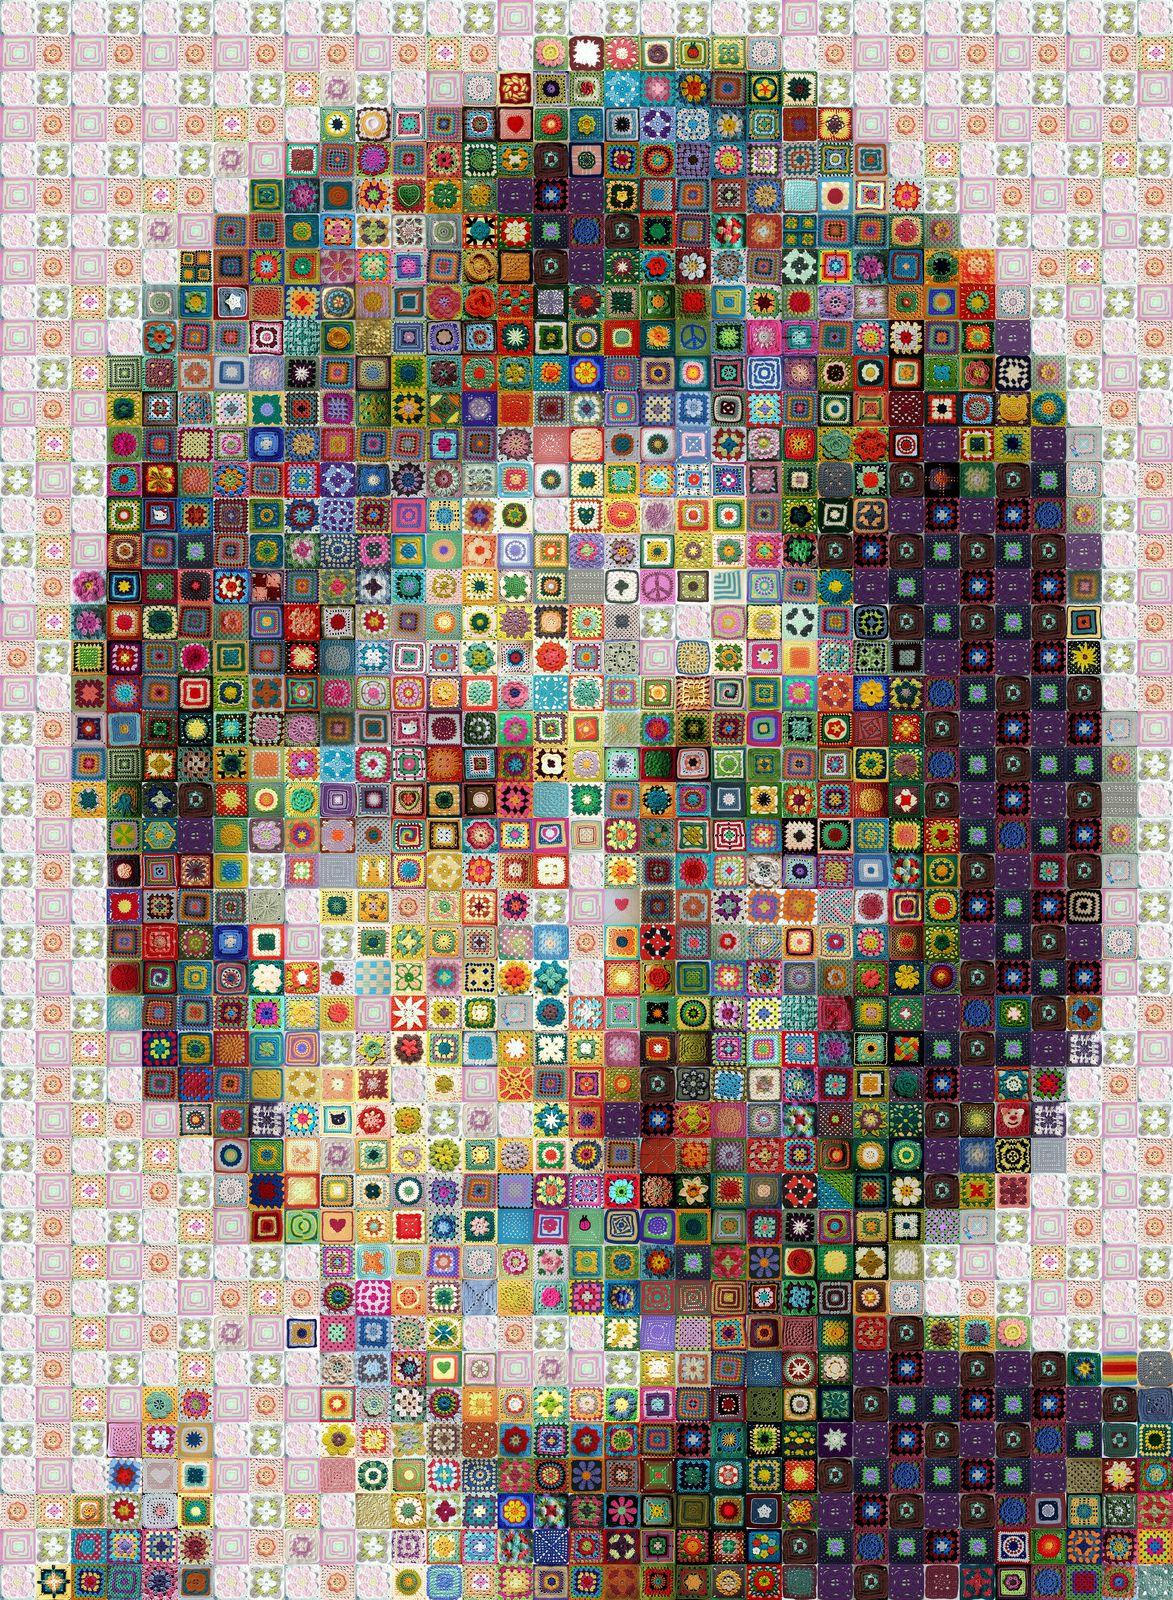 WBK Crochet John Lennon-Art-33x45 by workbyknight.deviantart.com on @deviantART